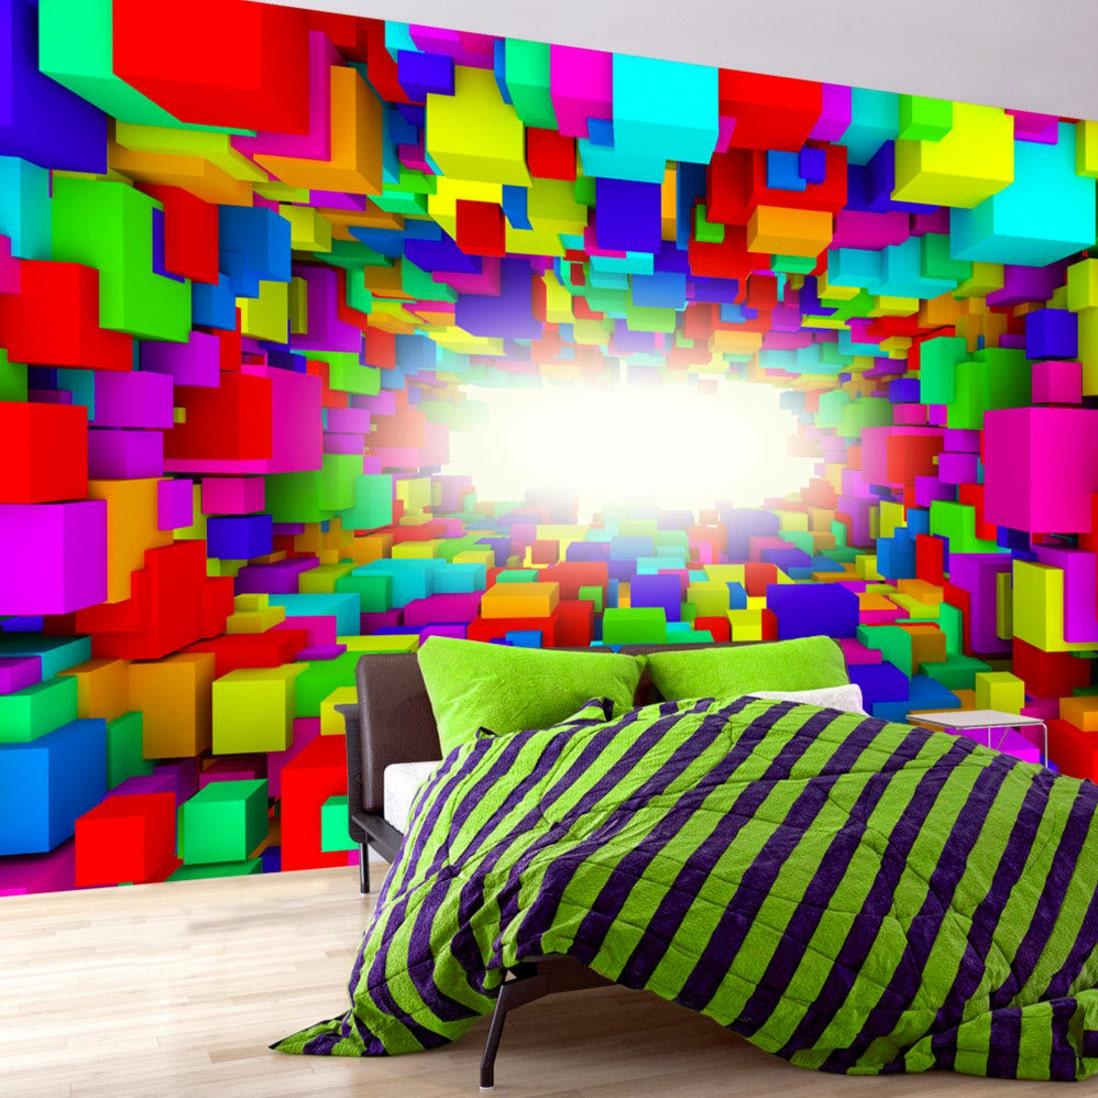 photo wallpaper wall murals non woven 3d squares modern art. Black Bedroom Furniture Sets. Home Design Ideas